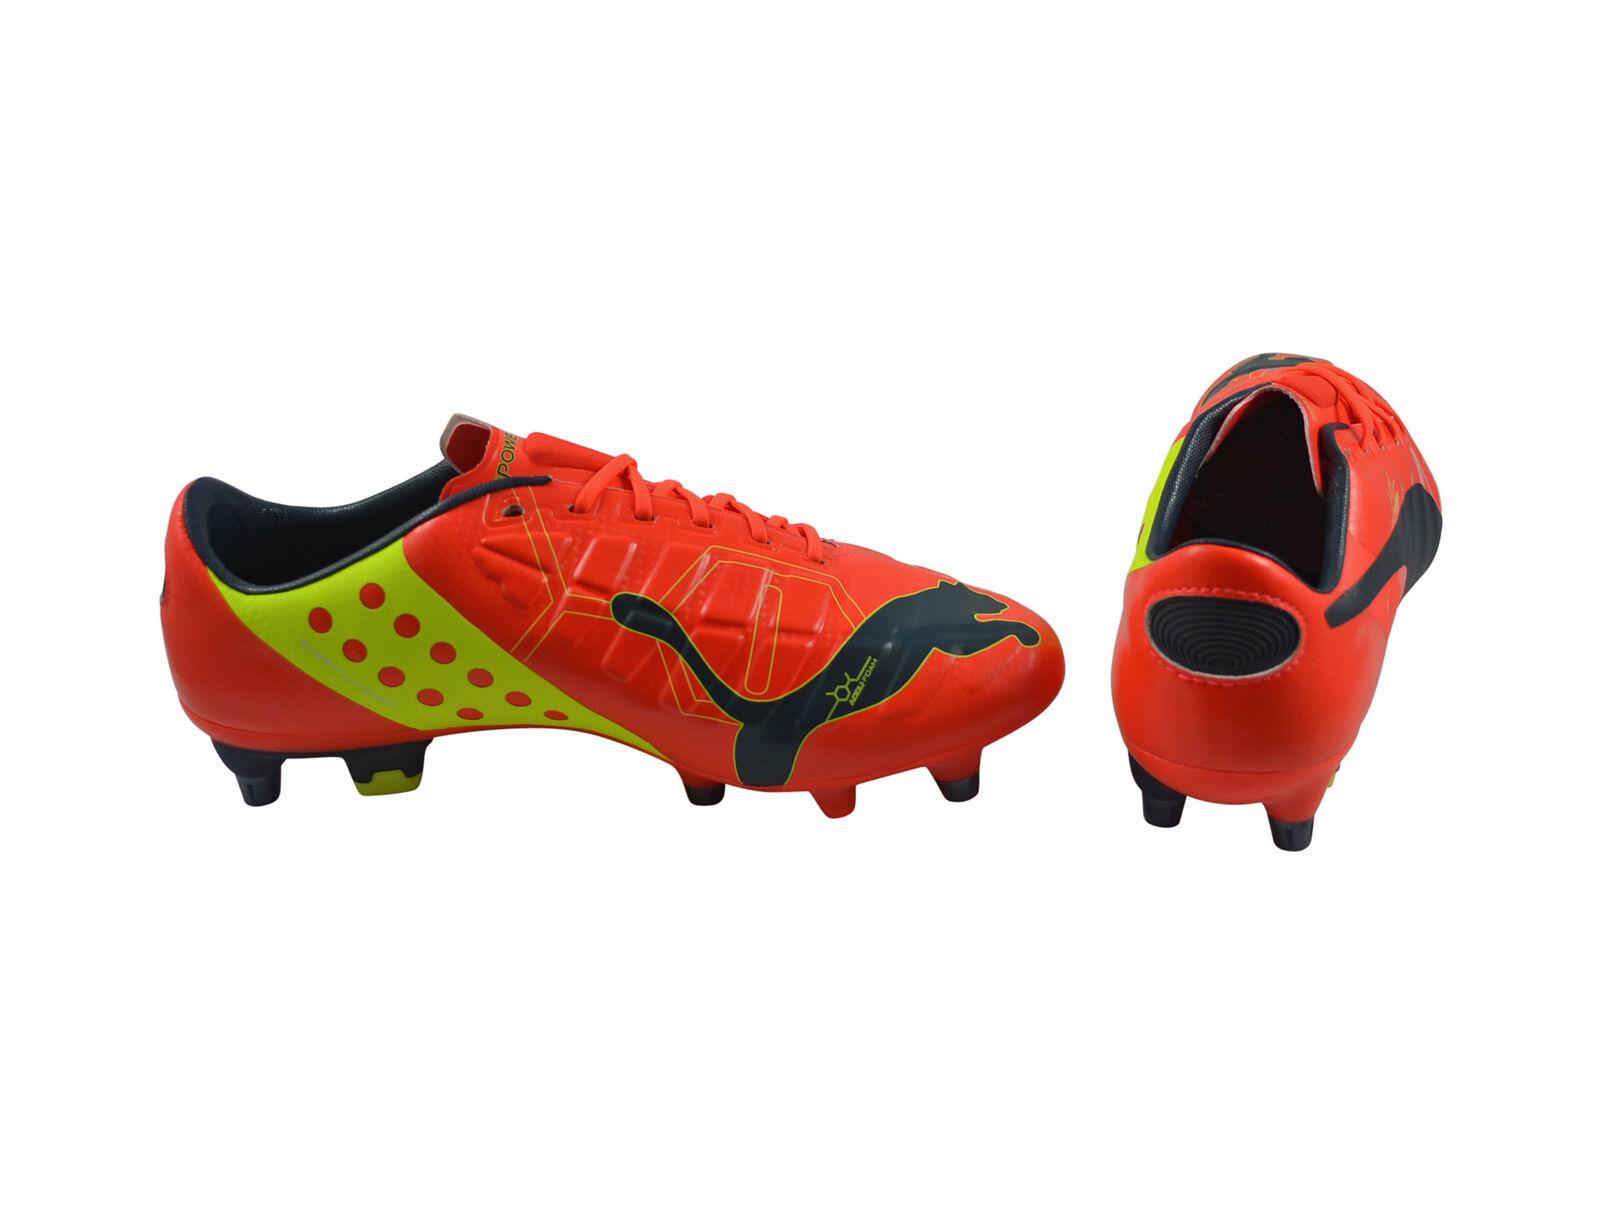 Puma evoPower 1 Mixed SG peach ombre bluee yellow Fußballschuhe 102944 01